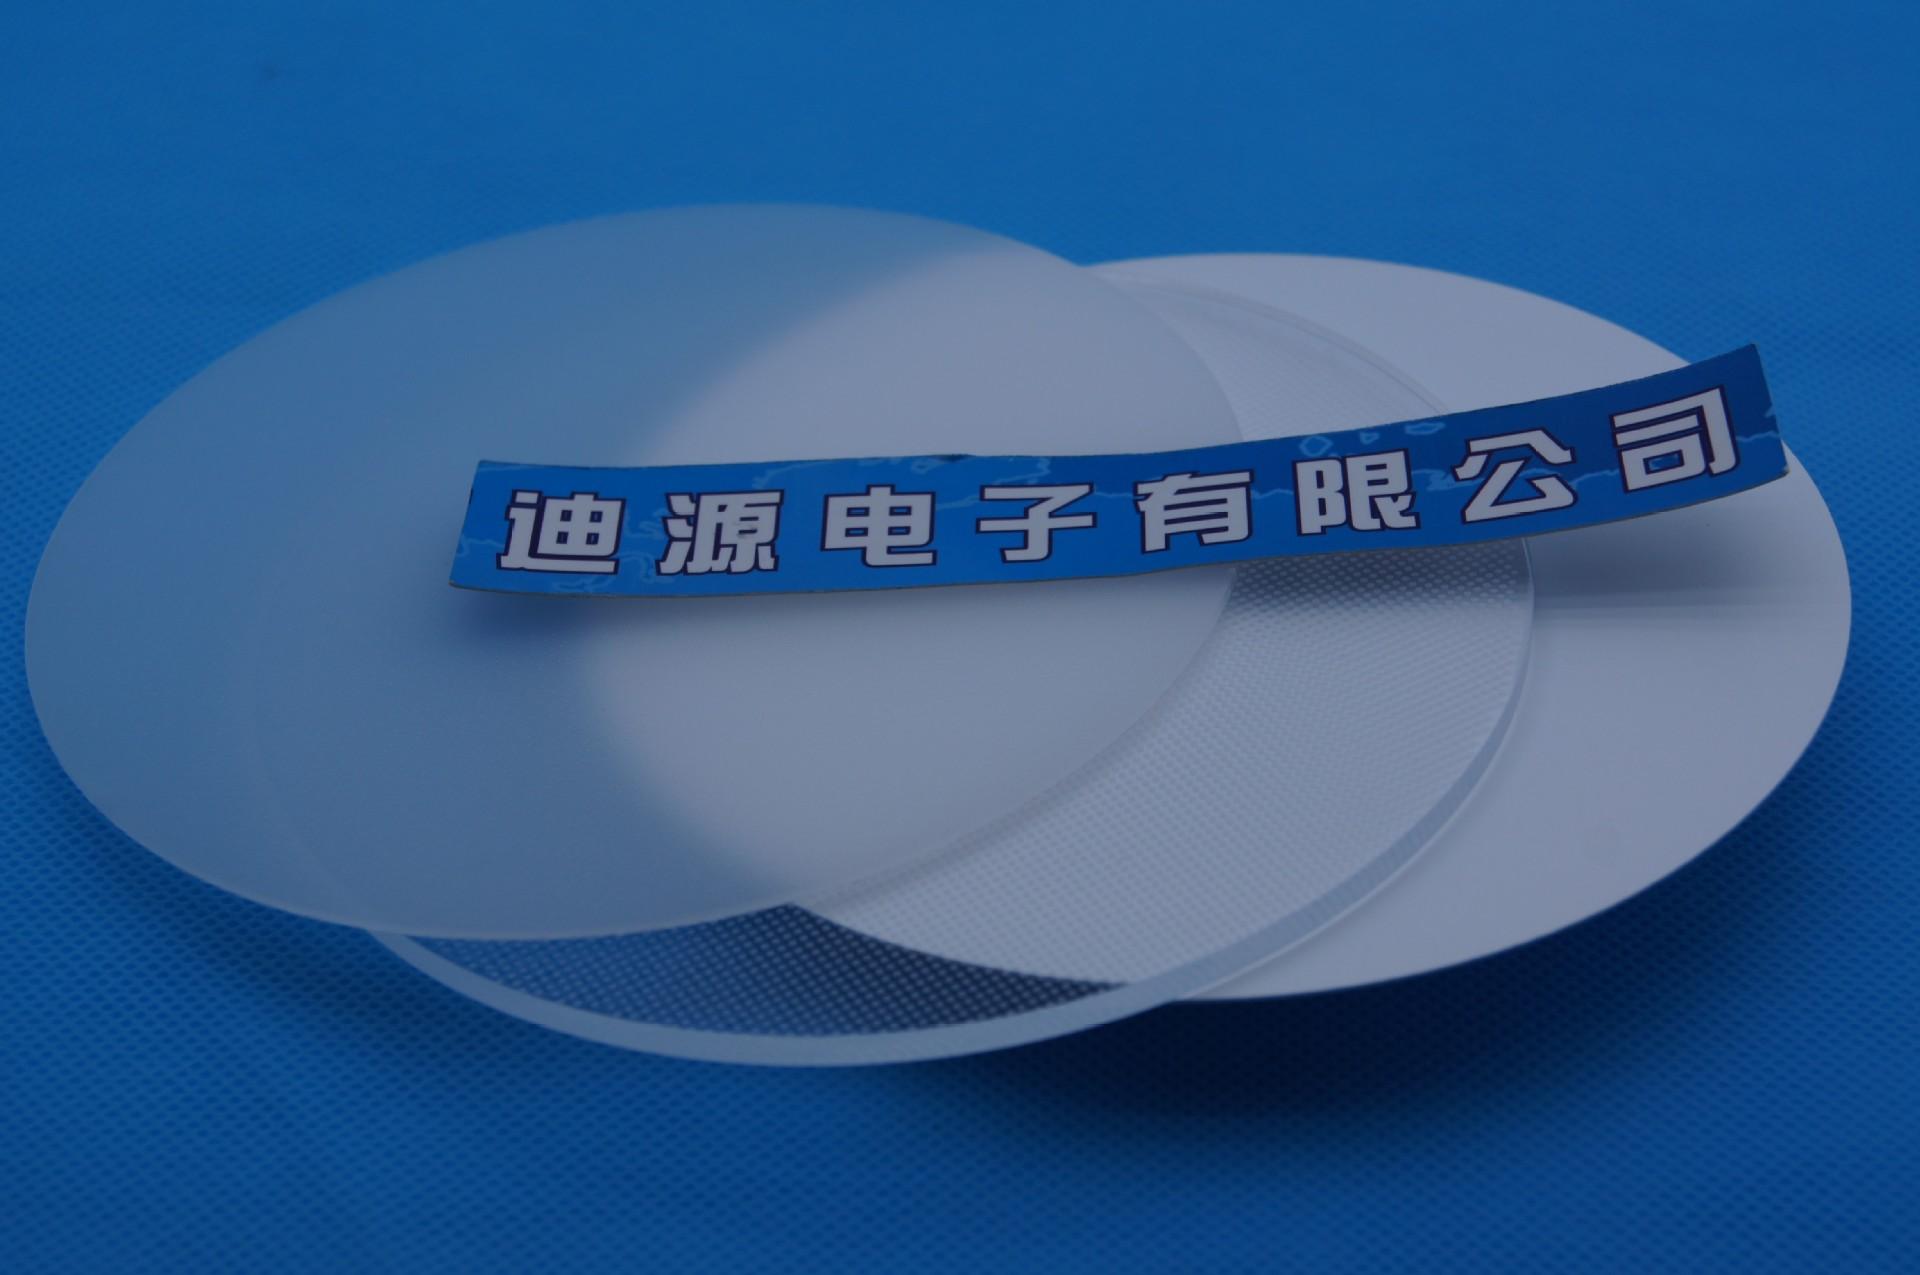 Tấm dẫn sáng  Factory direct injection led panel light guide plate Taiwan Chimei LGP acrylic light g